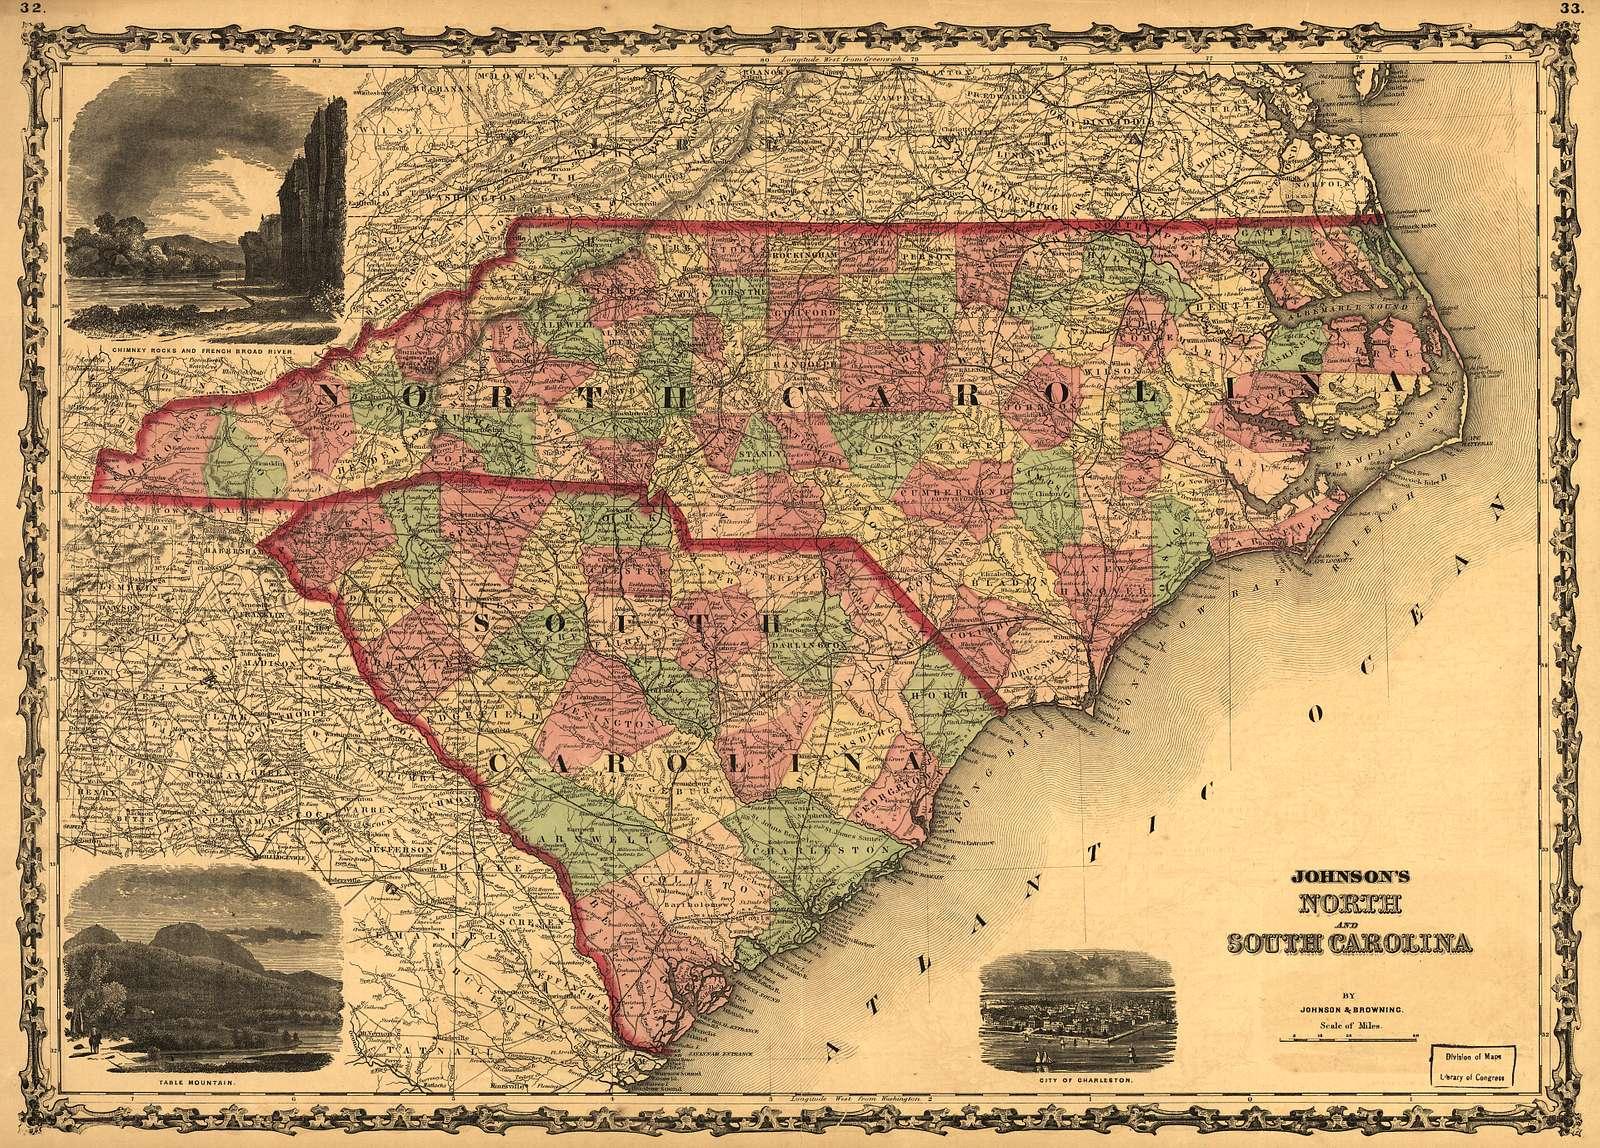 Johnson's North and South Carolina.